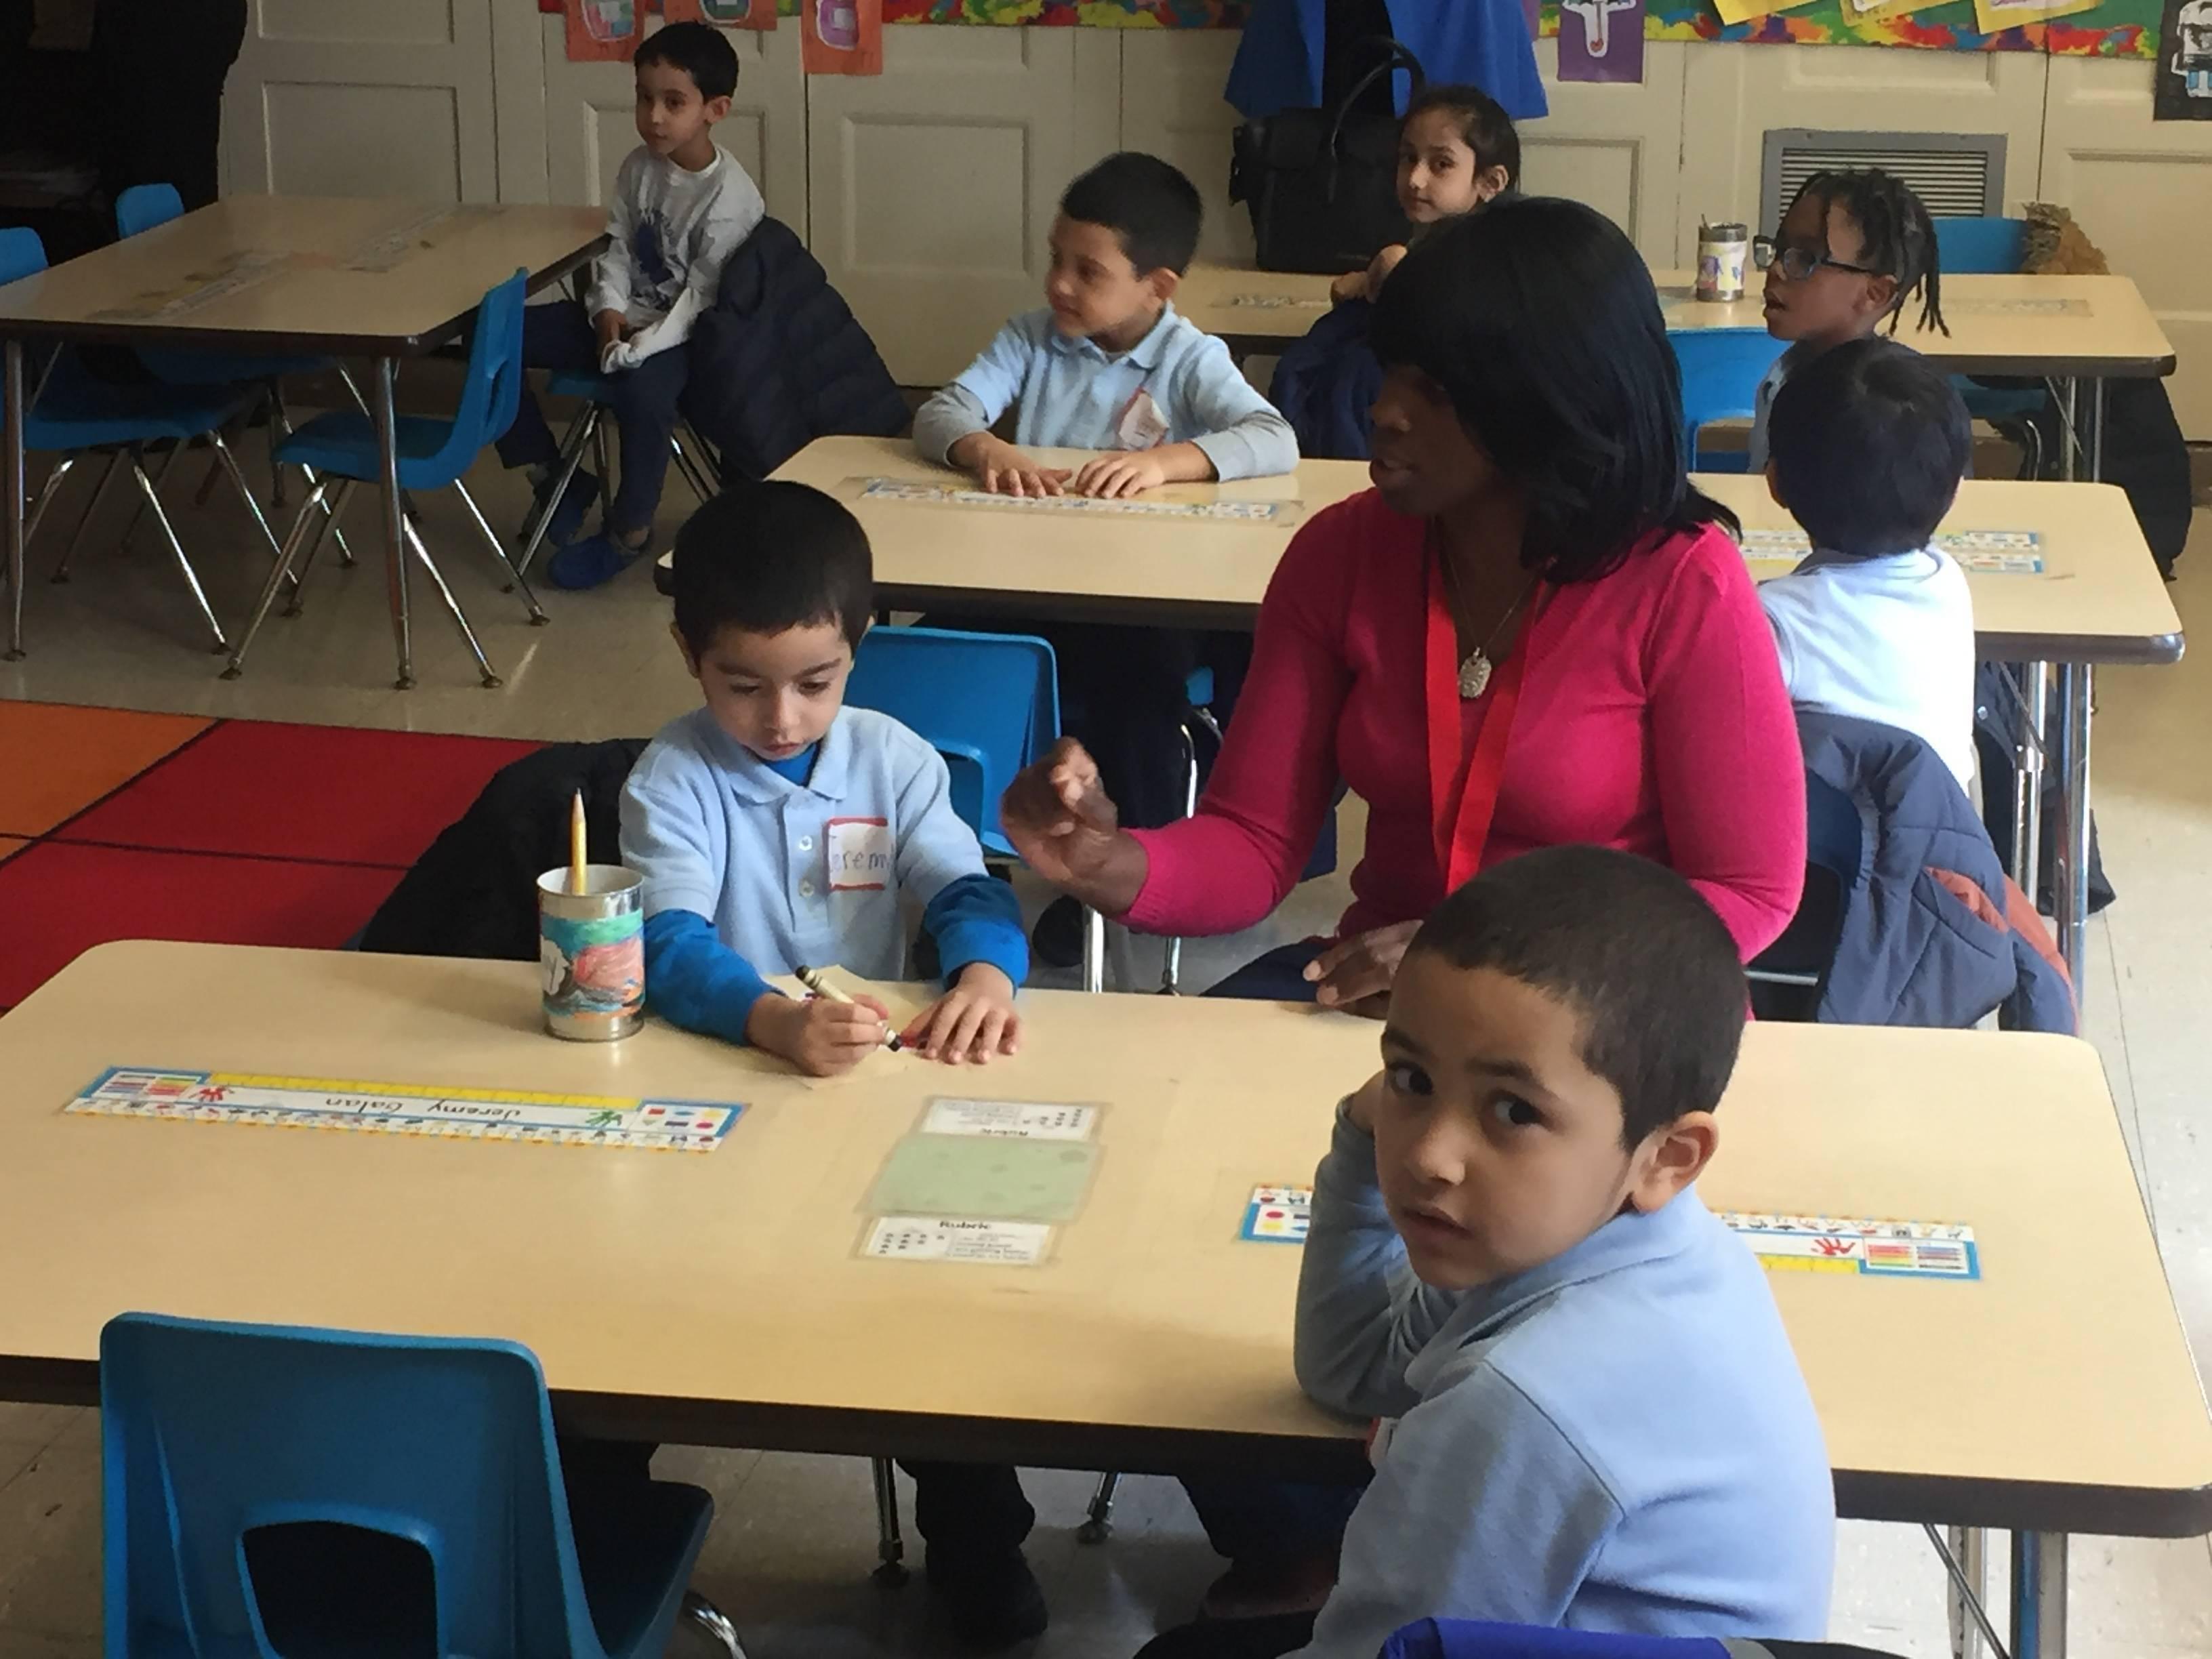 2b5123fb7fef45519145_Redmon_in_Classroom.JPG